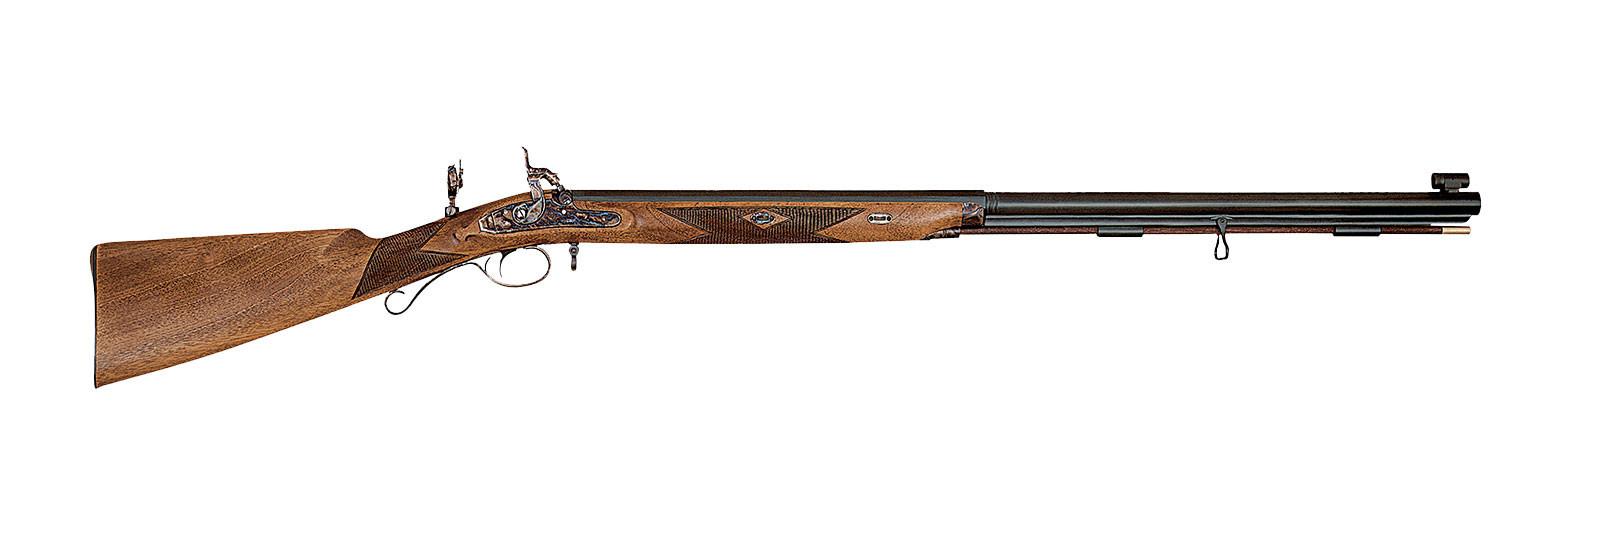 Fucile/mortimer perc. rifle .54